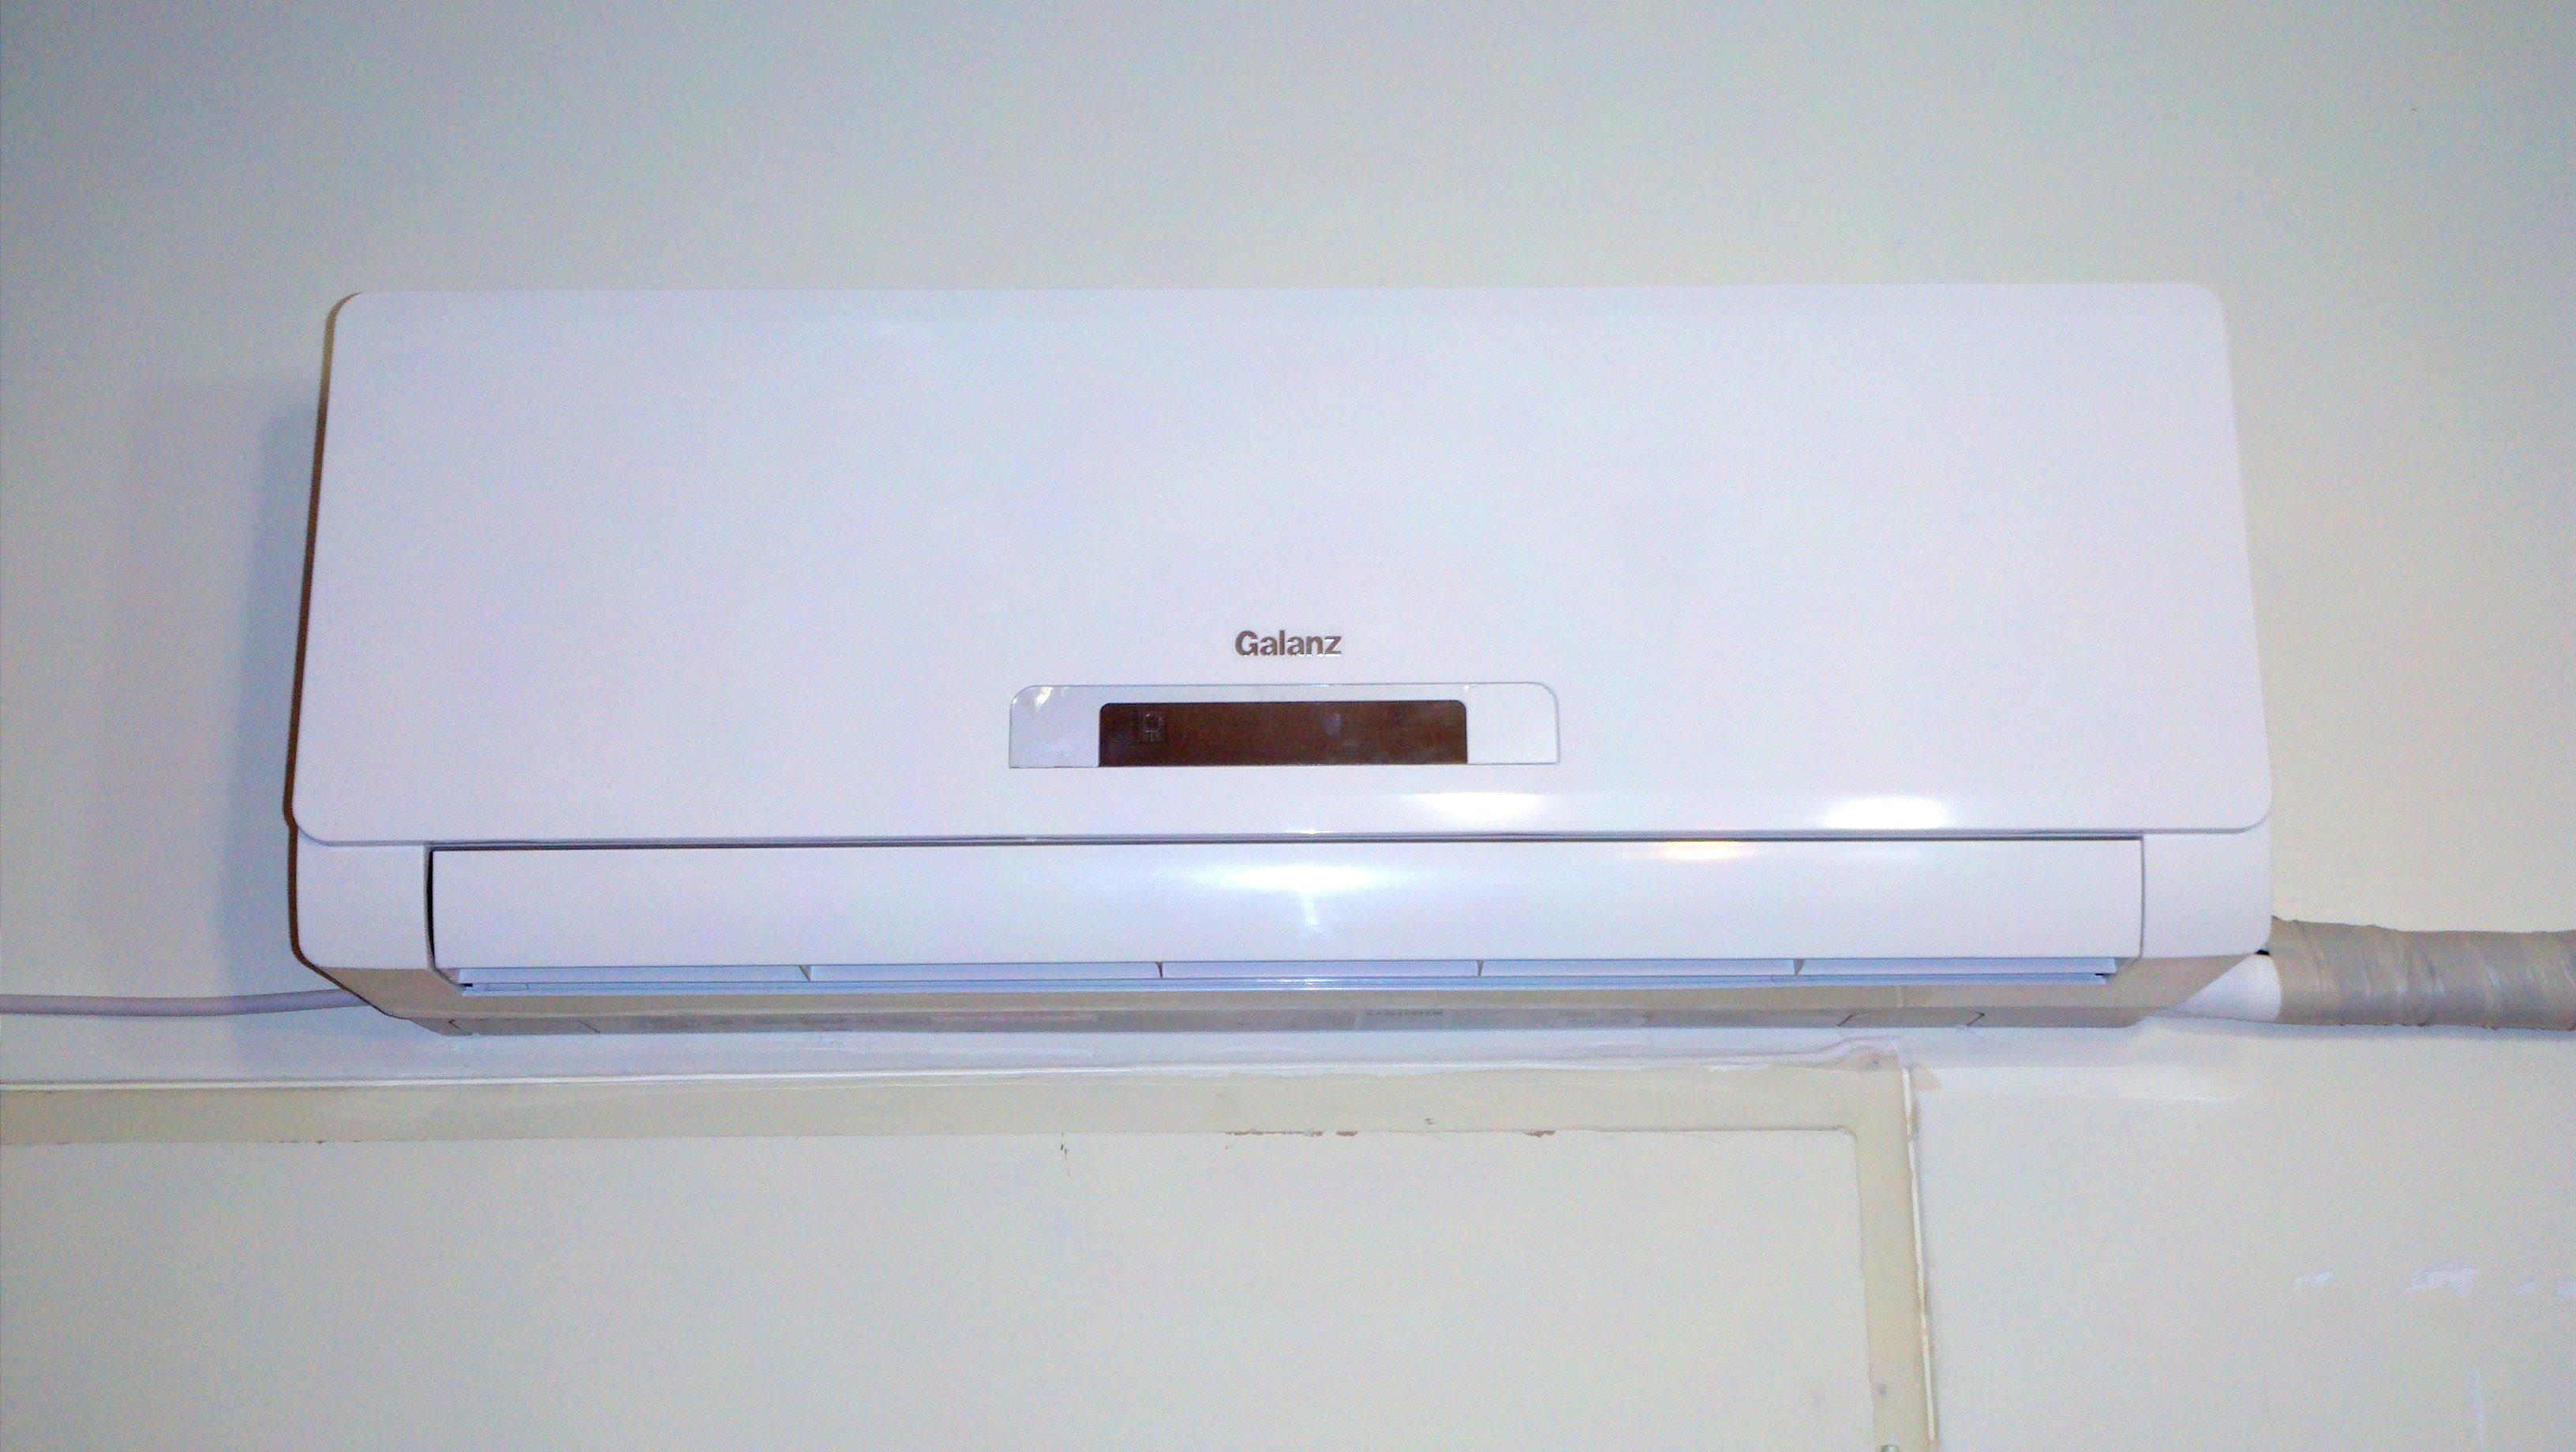 Galanz Air Conditioner 1.jpg #462B28